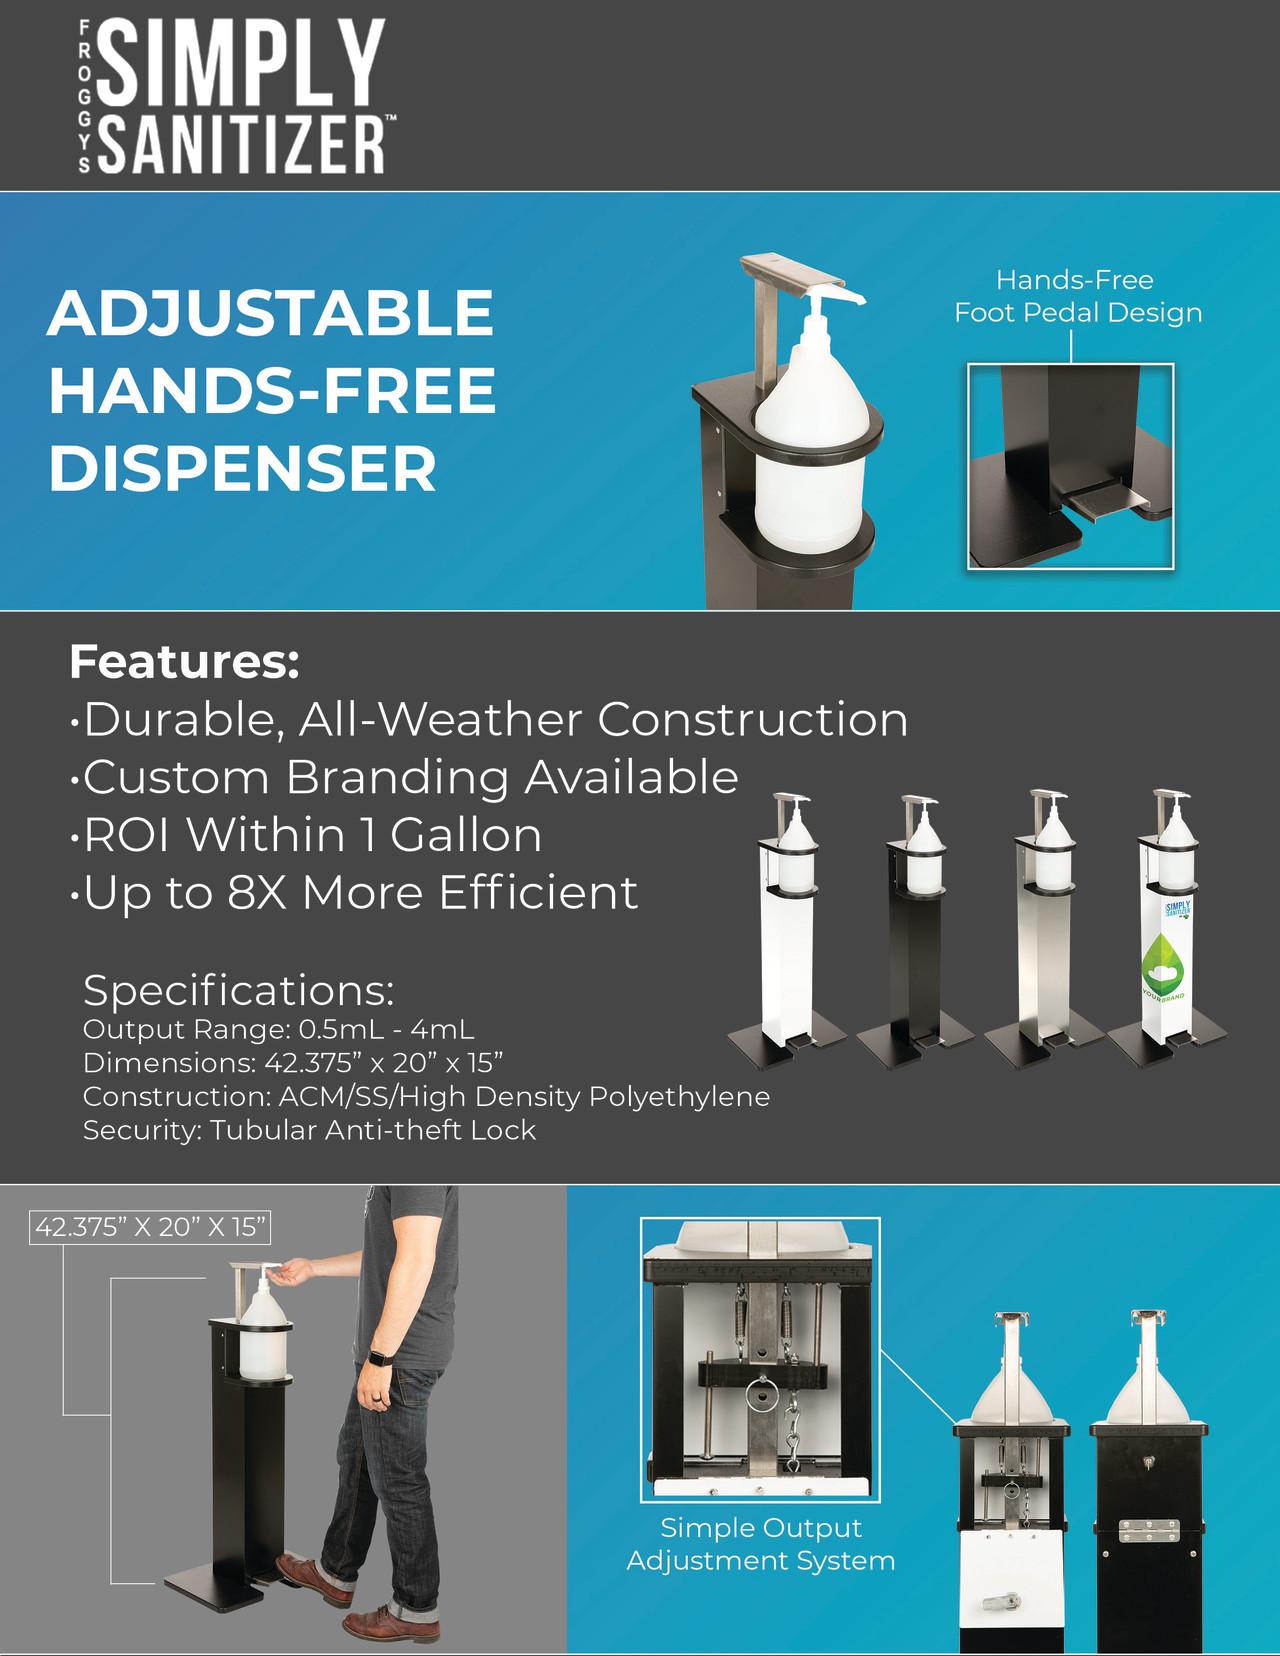 Hands-free dispenser options